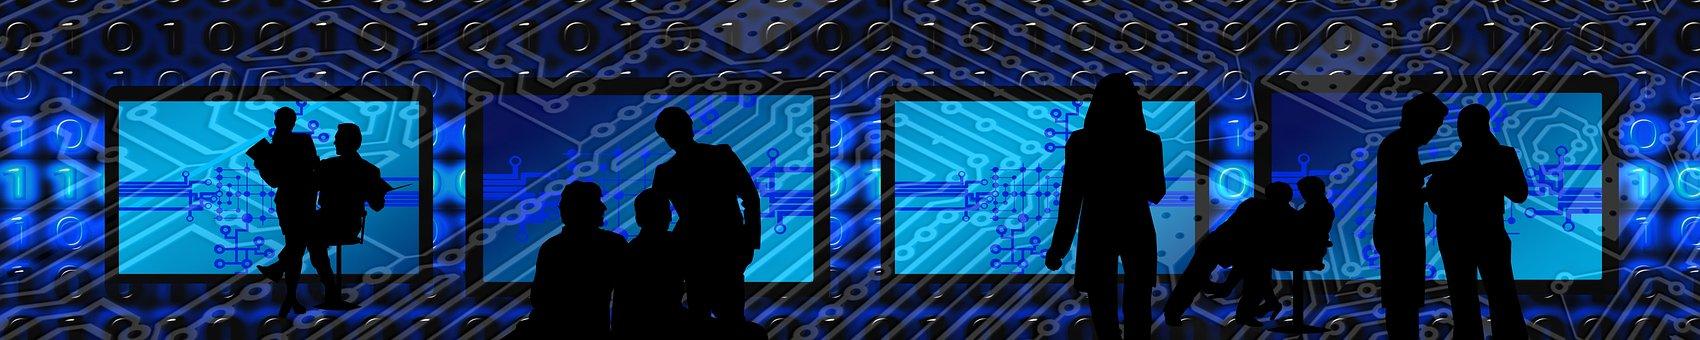 Binary, Binary System, Personal, Silhouettes, Developer